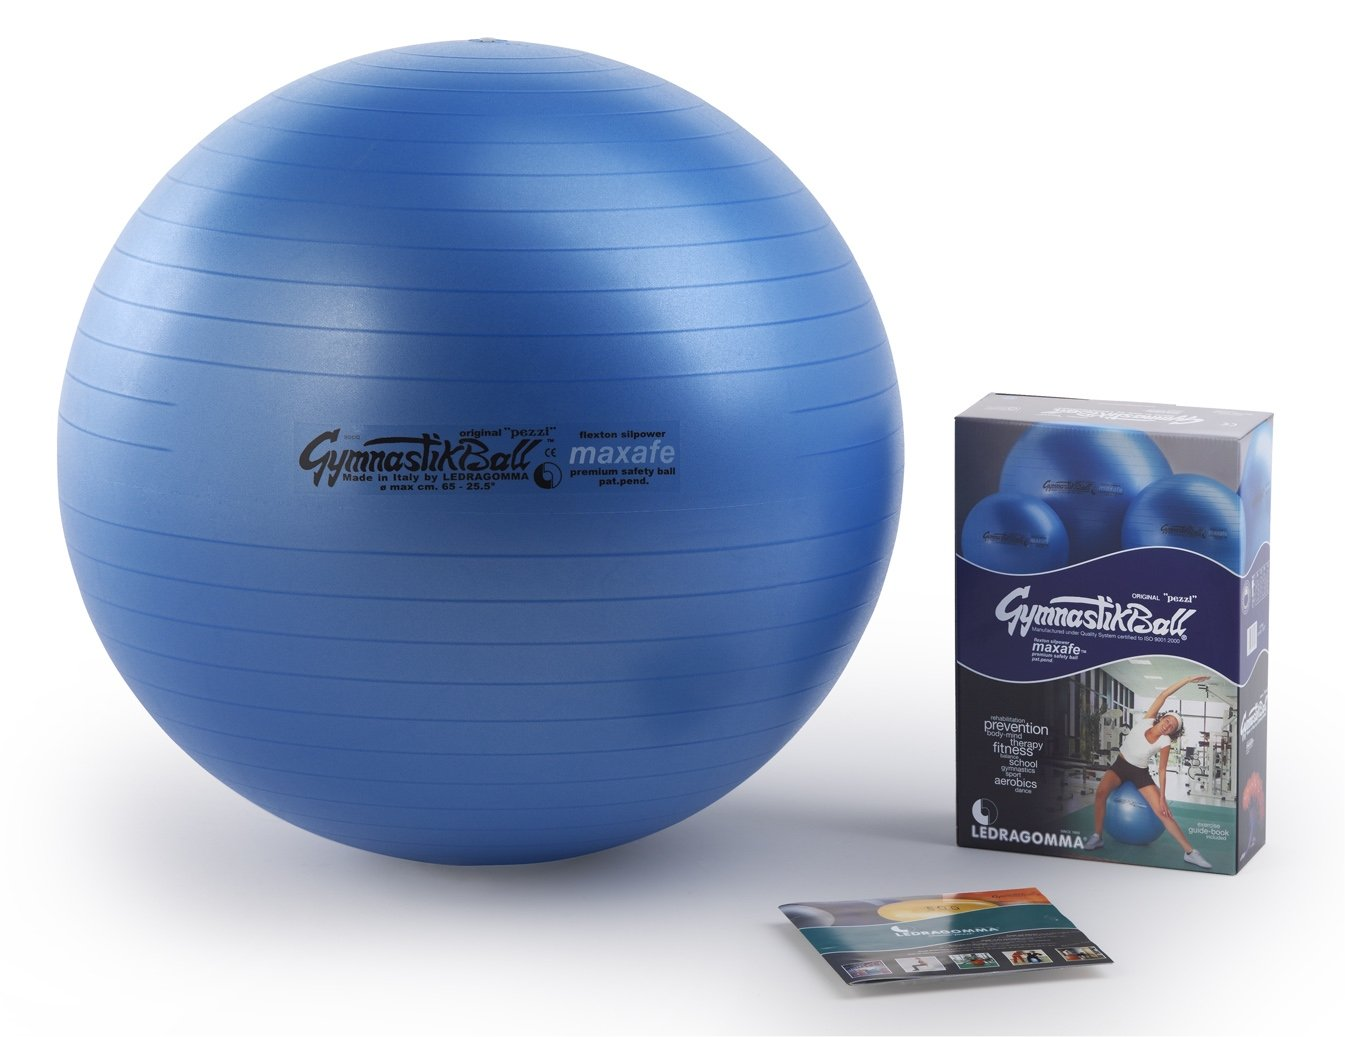 Maxafe Gym Ball - 53cm Physical Company